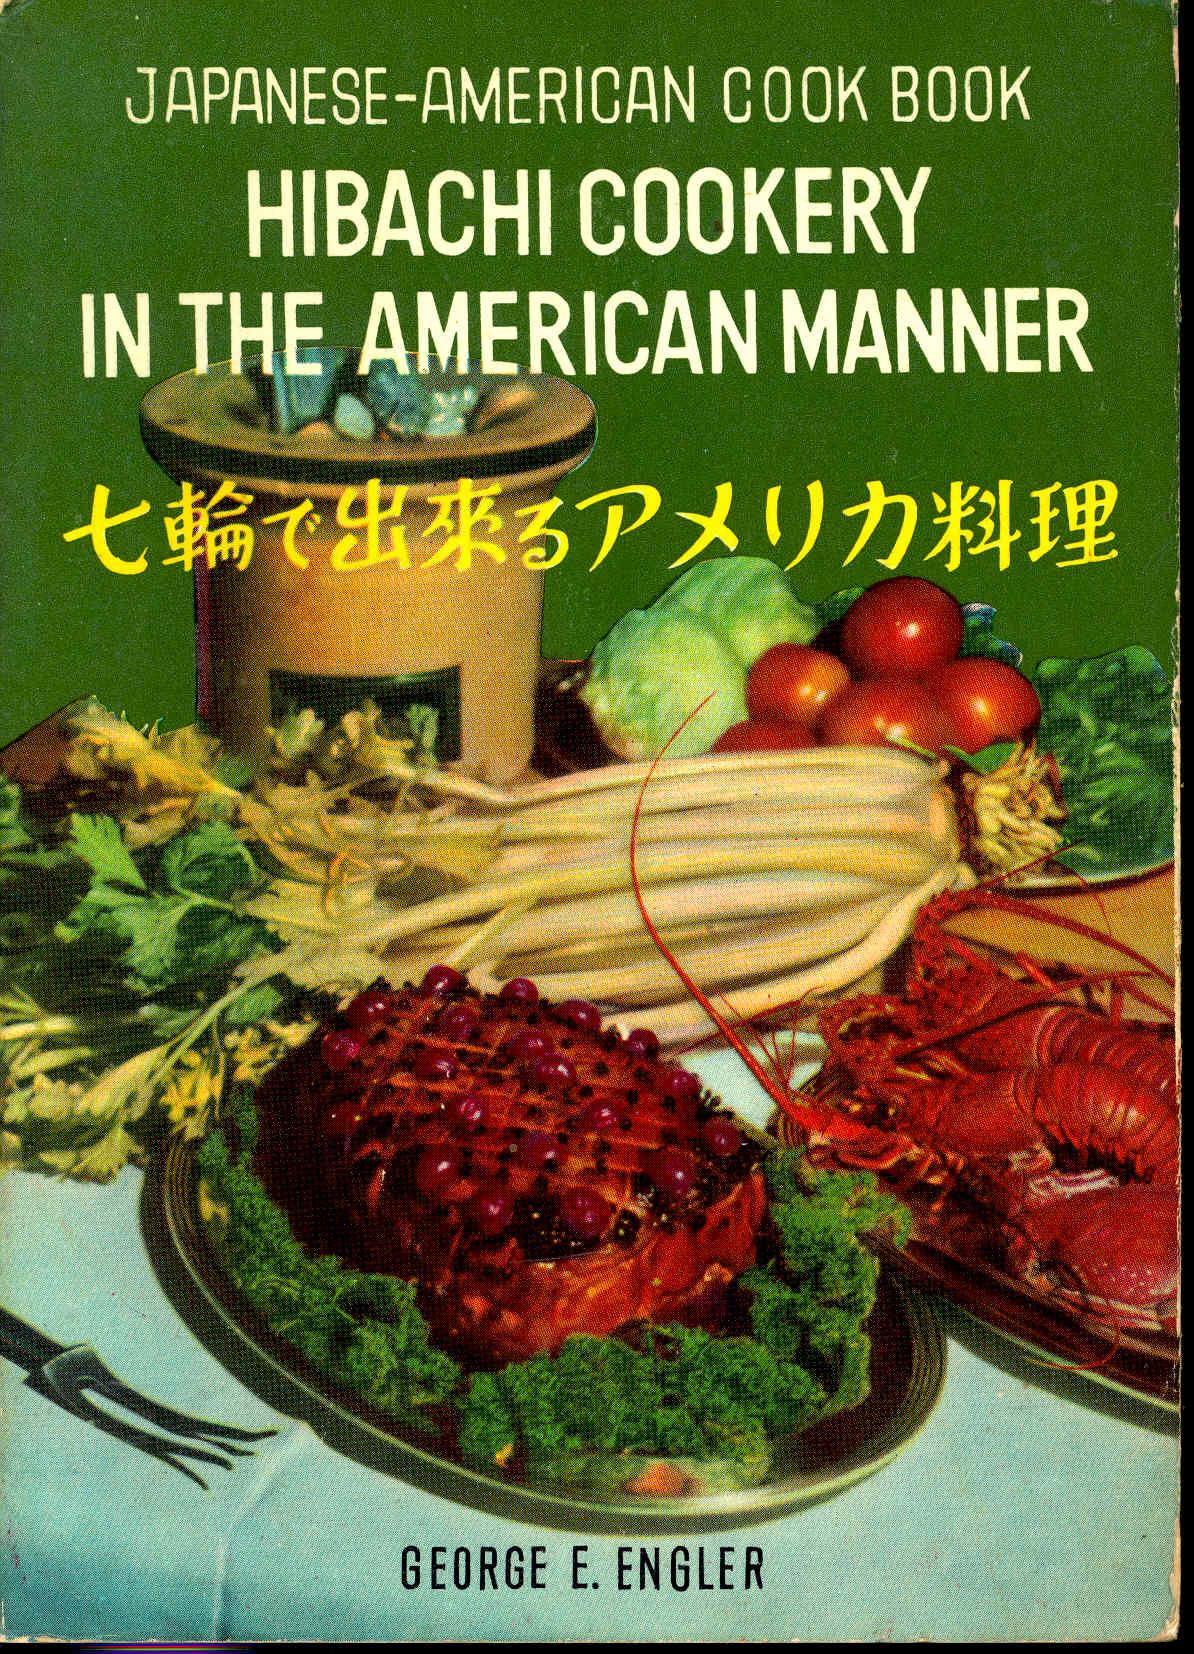 Hibachi cookery in the American manner : Japanese-American cookbook = 七輪で出來るアメリカ料理 [Shichirin de dekiru Amerika ryōr]